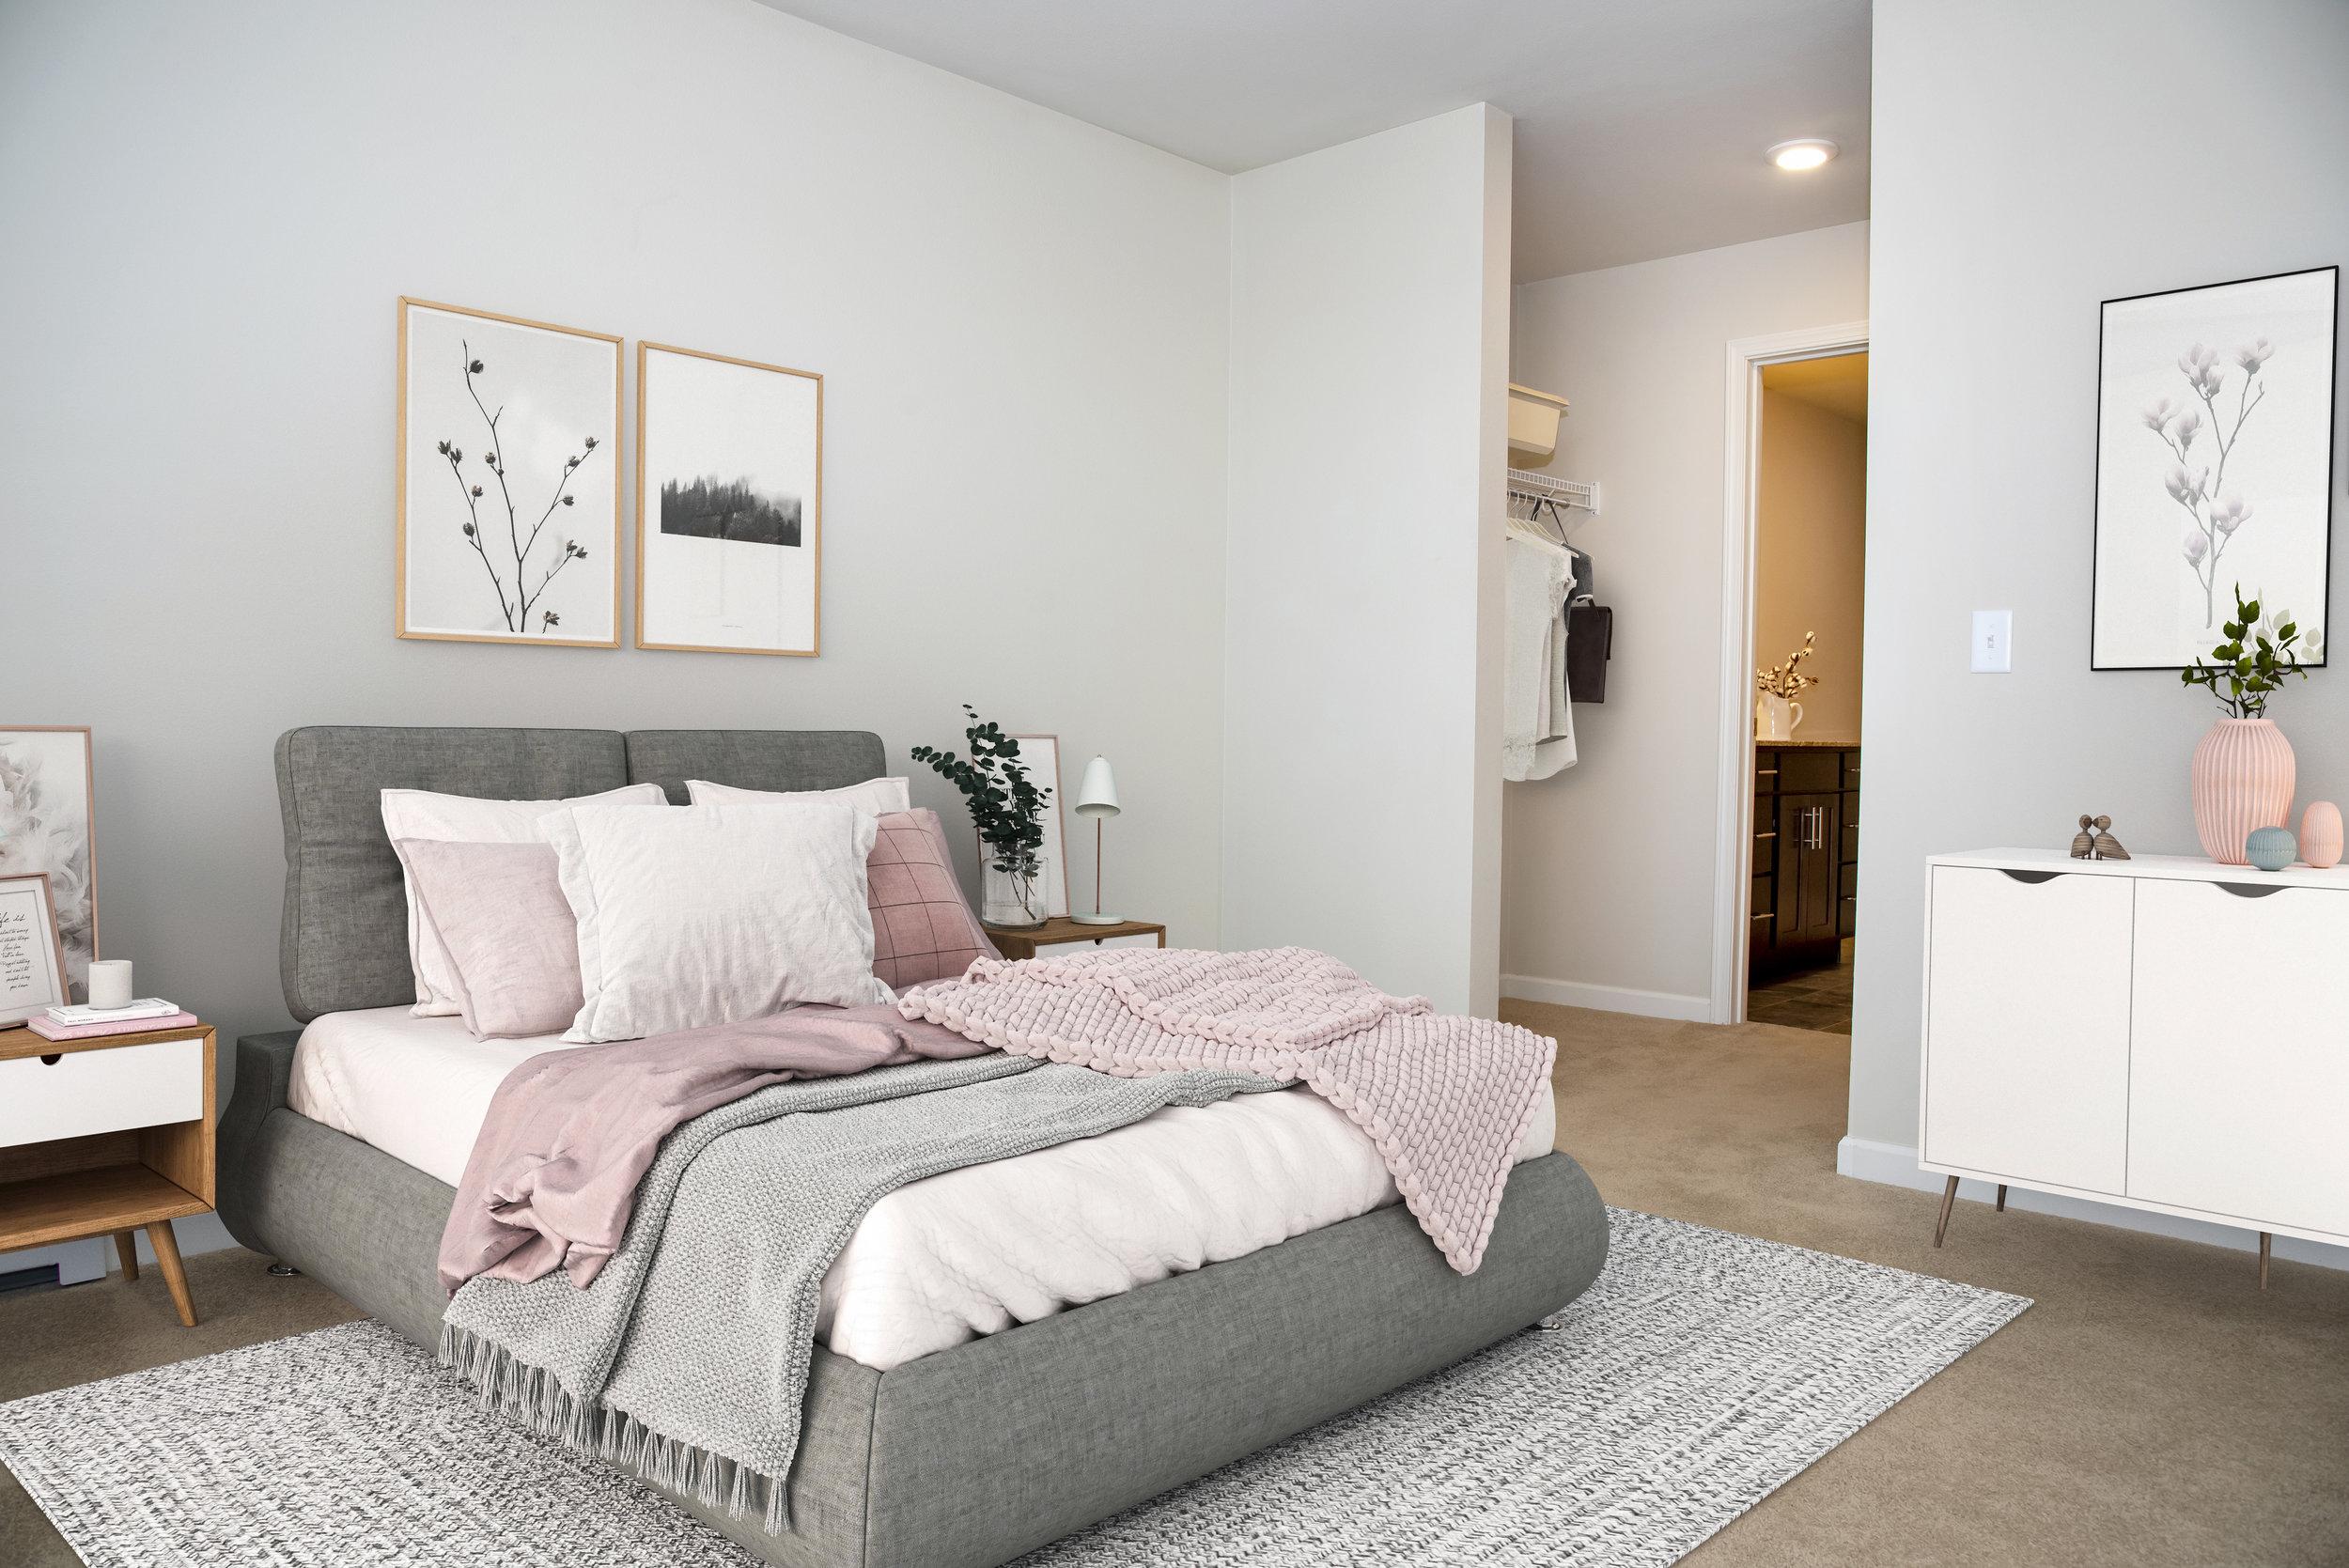 04 Elegant Bedrooms with Walk-in Closets.jpg